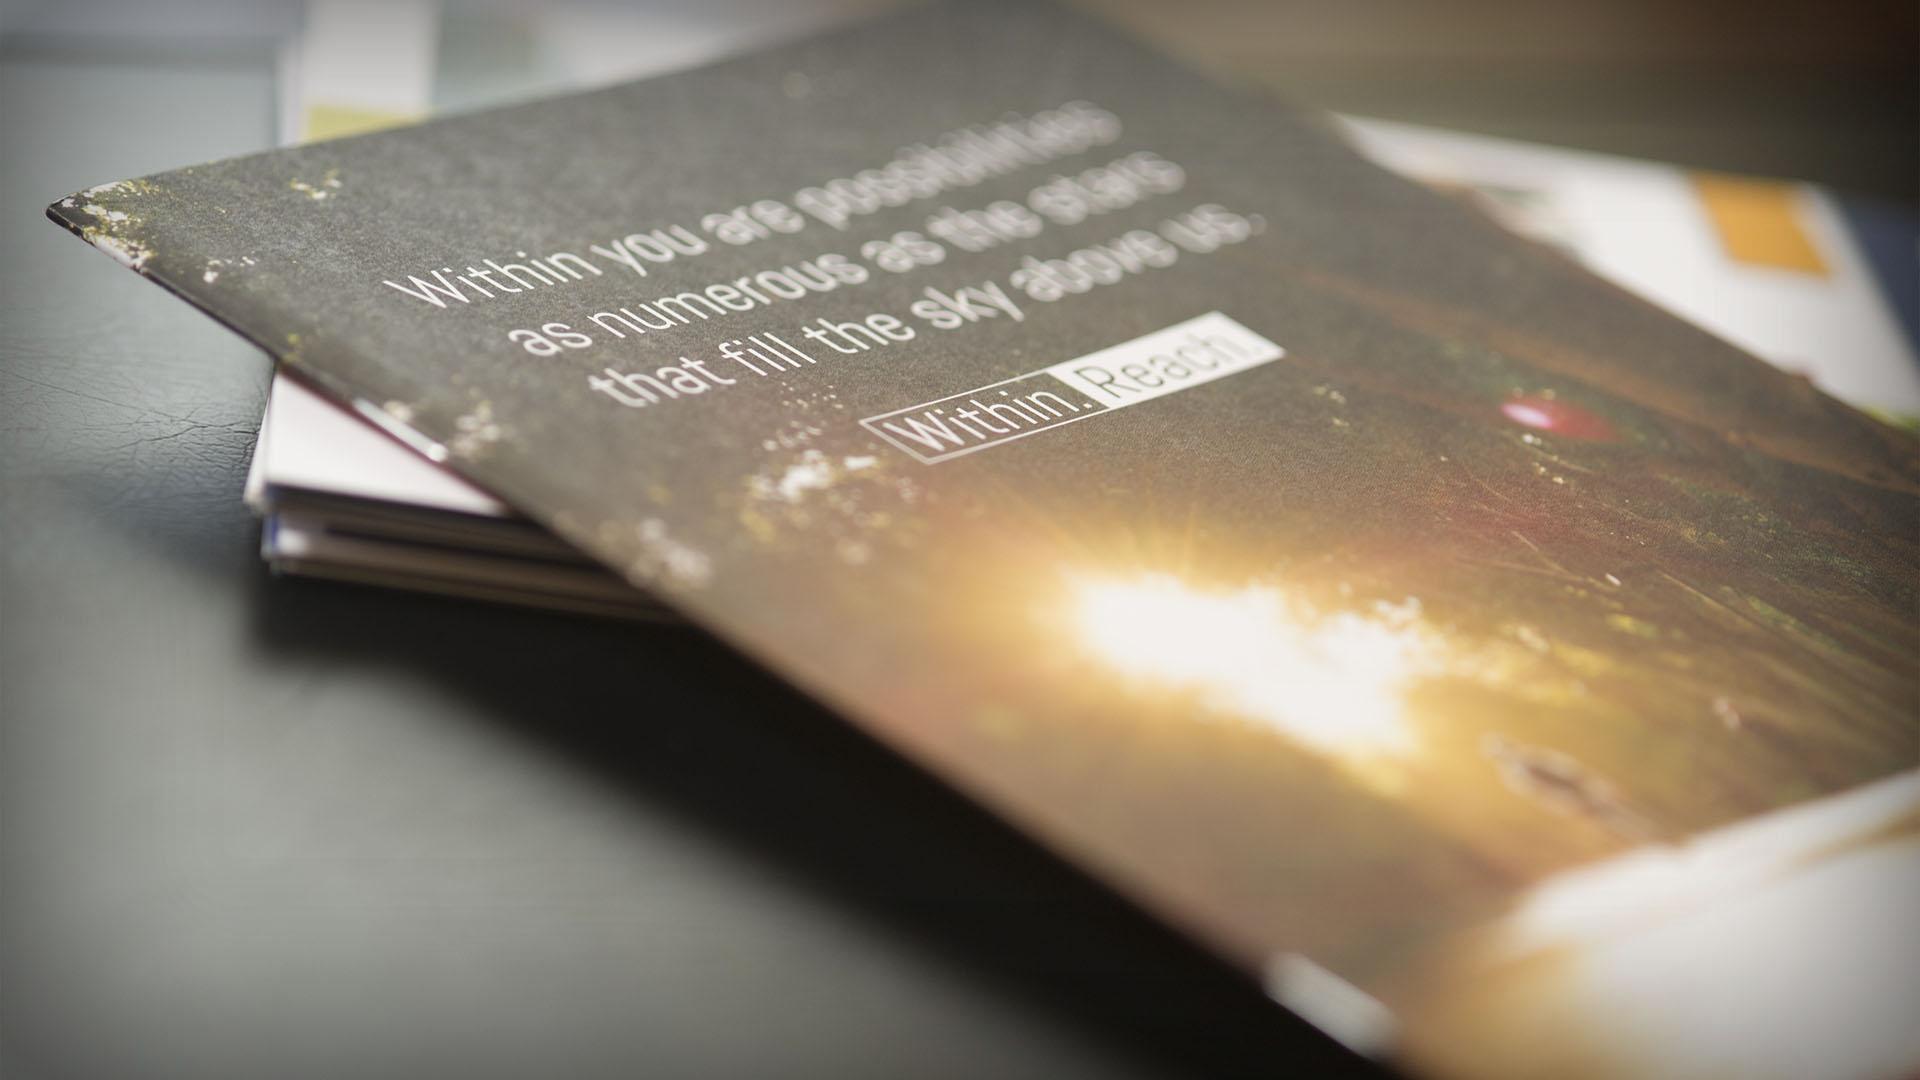 Albuquerque-Academy-Branding-Marketing-Admissions-Campaign-Mini-Viewbook-3.jpg